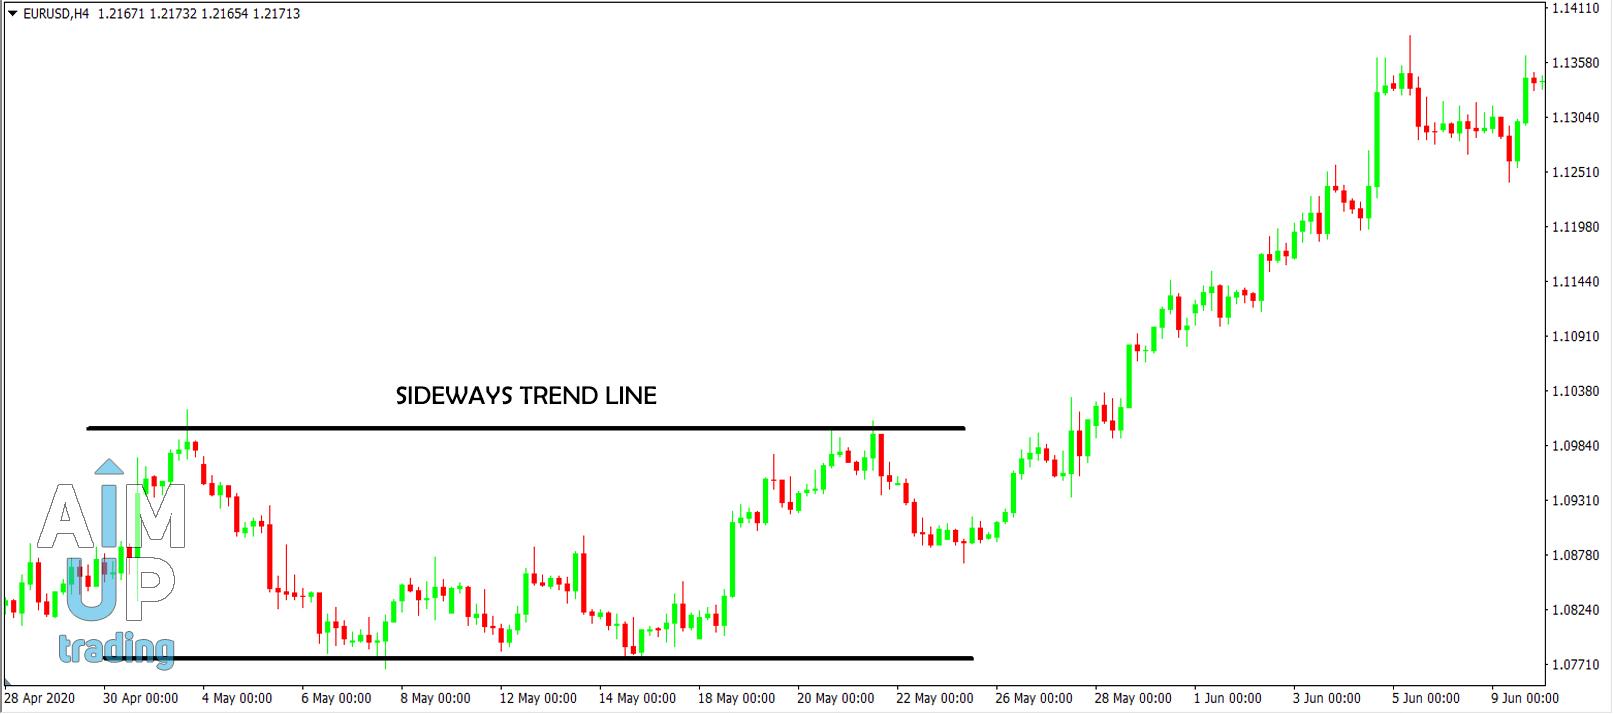 Sideways trend ranging